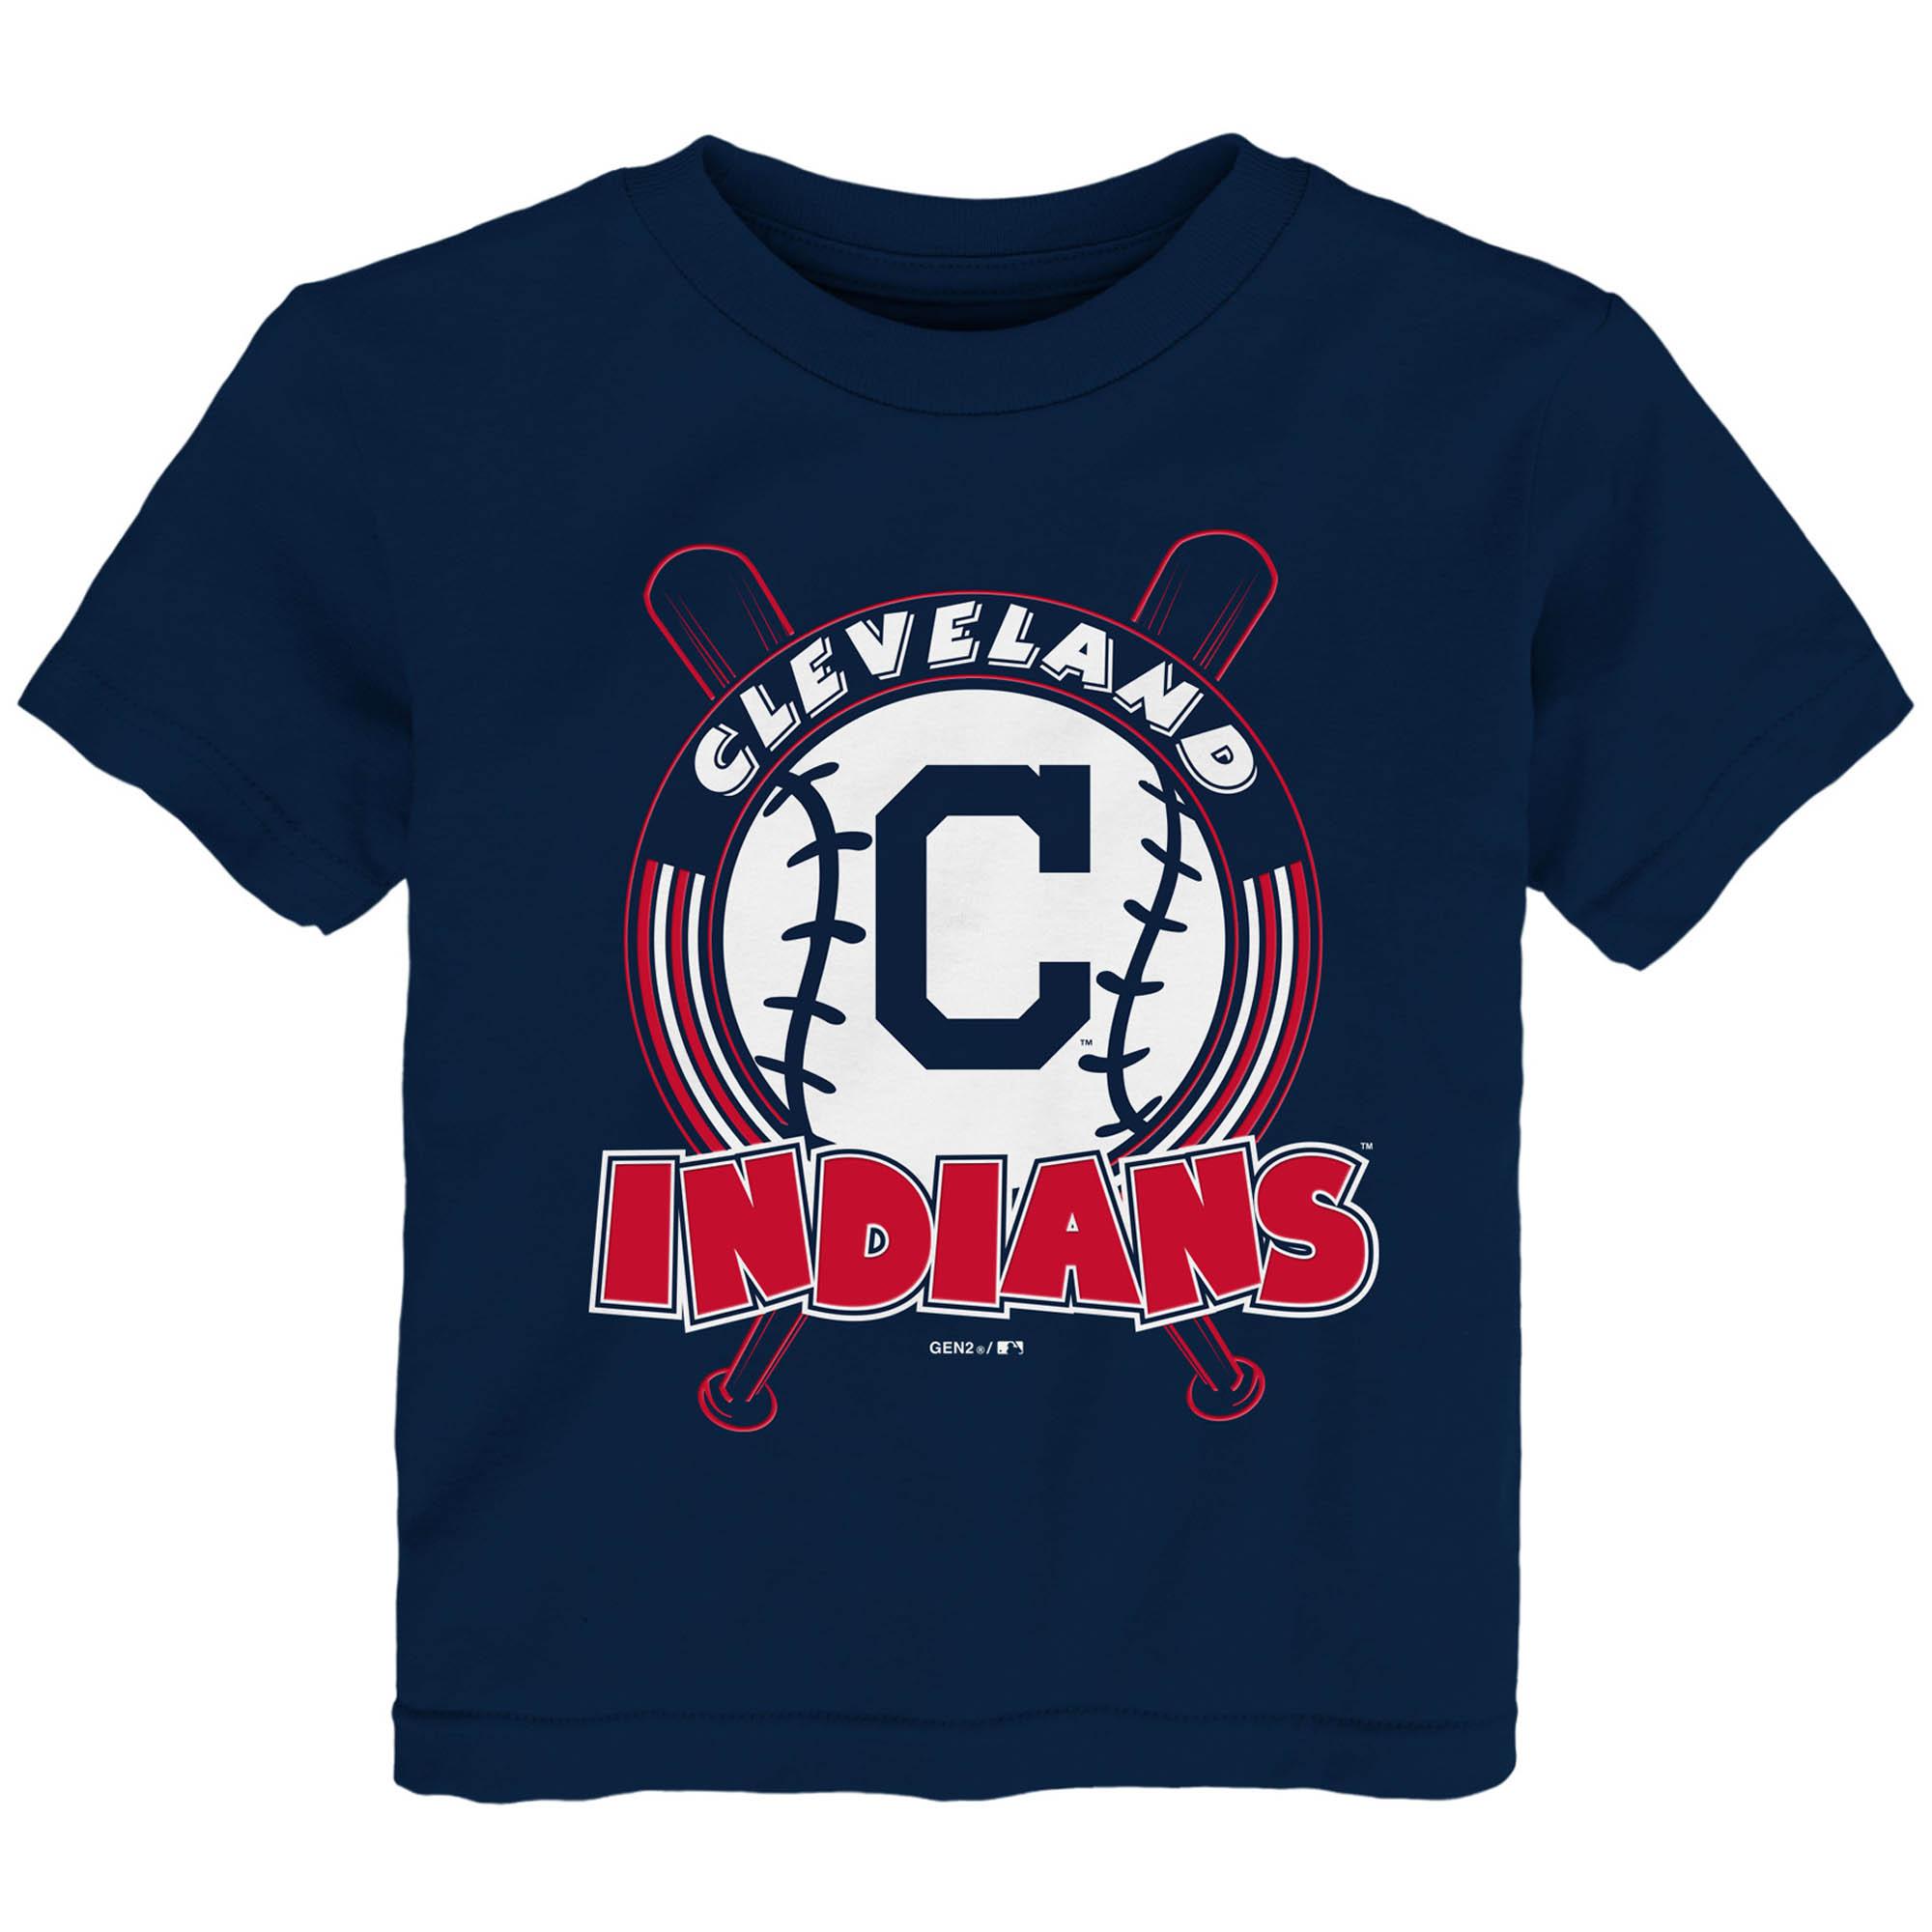 Cleveland Indians Toddler Fun Park T-Shirt - Navy